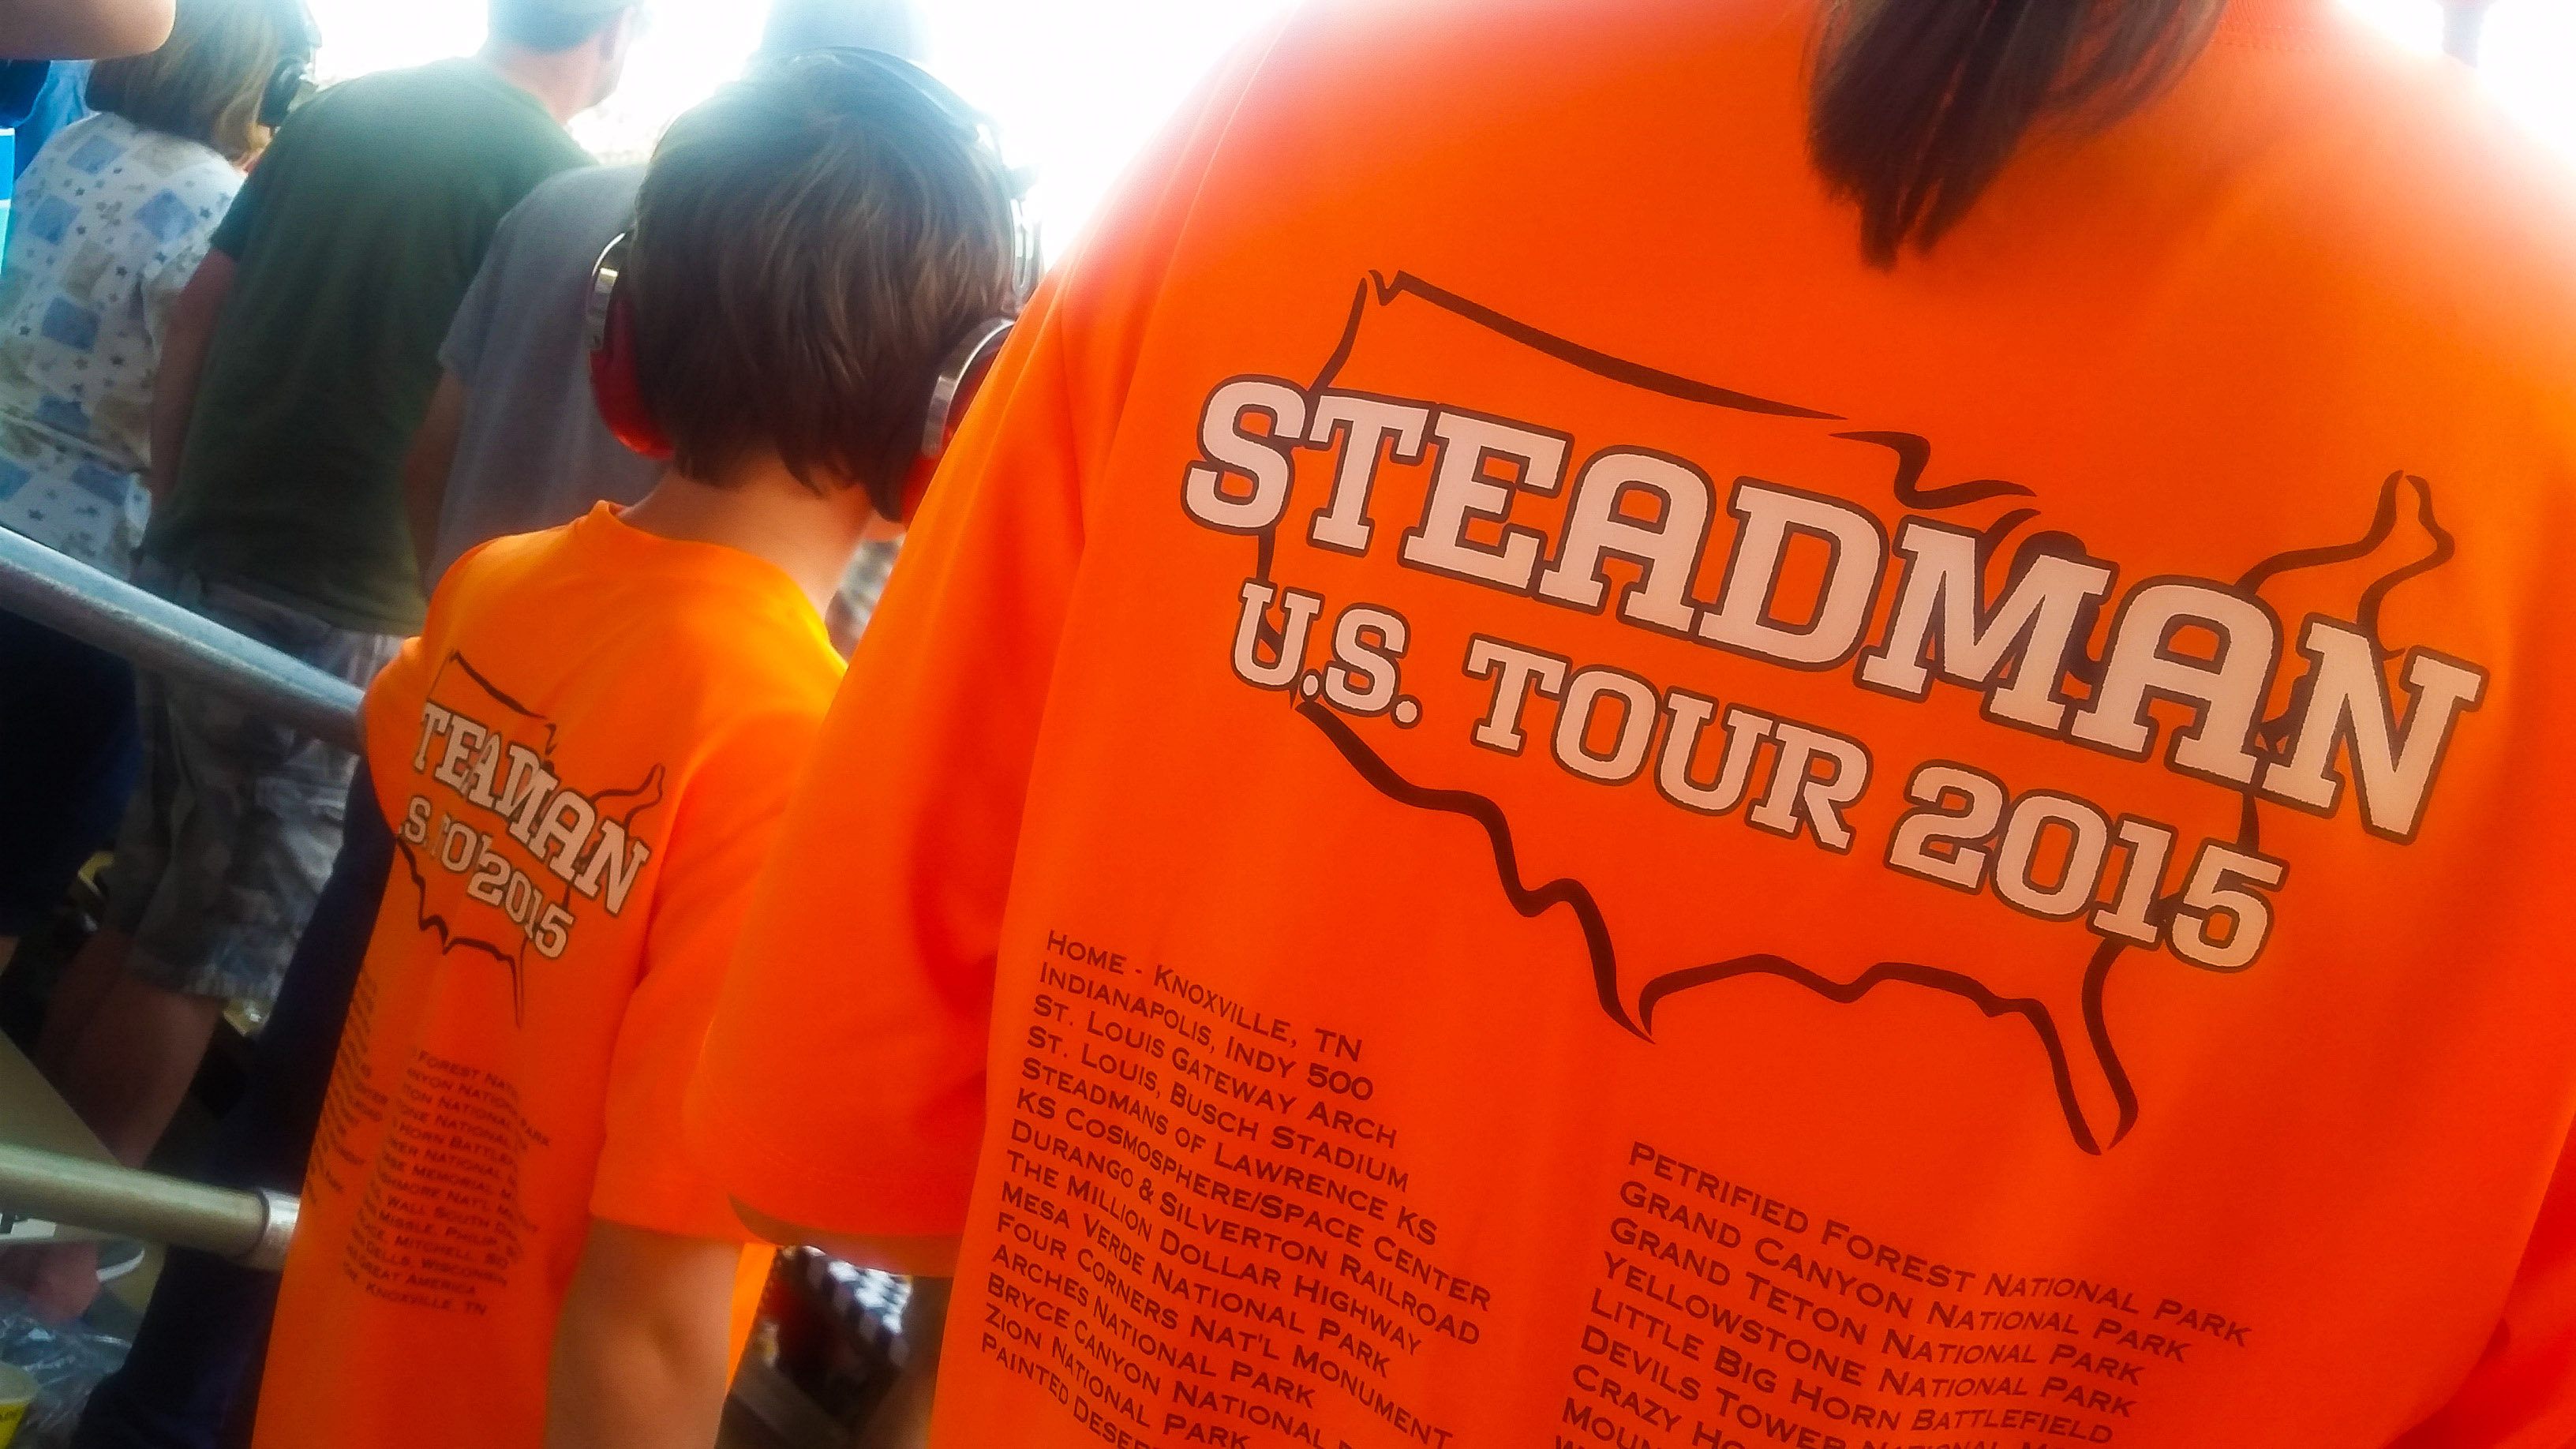 Steadman US Tour 2015